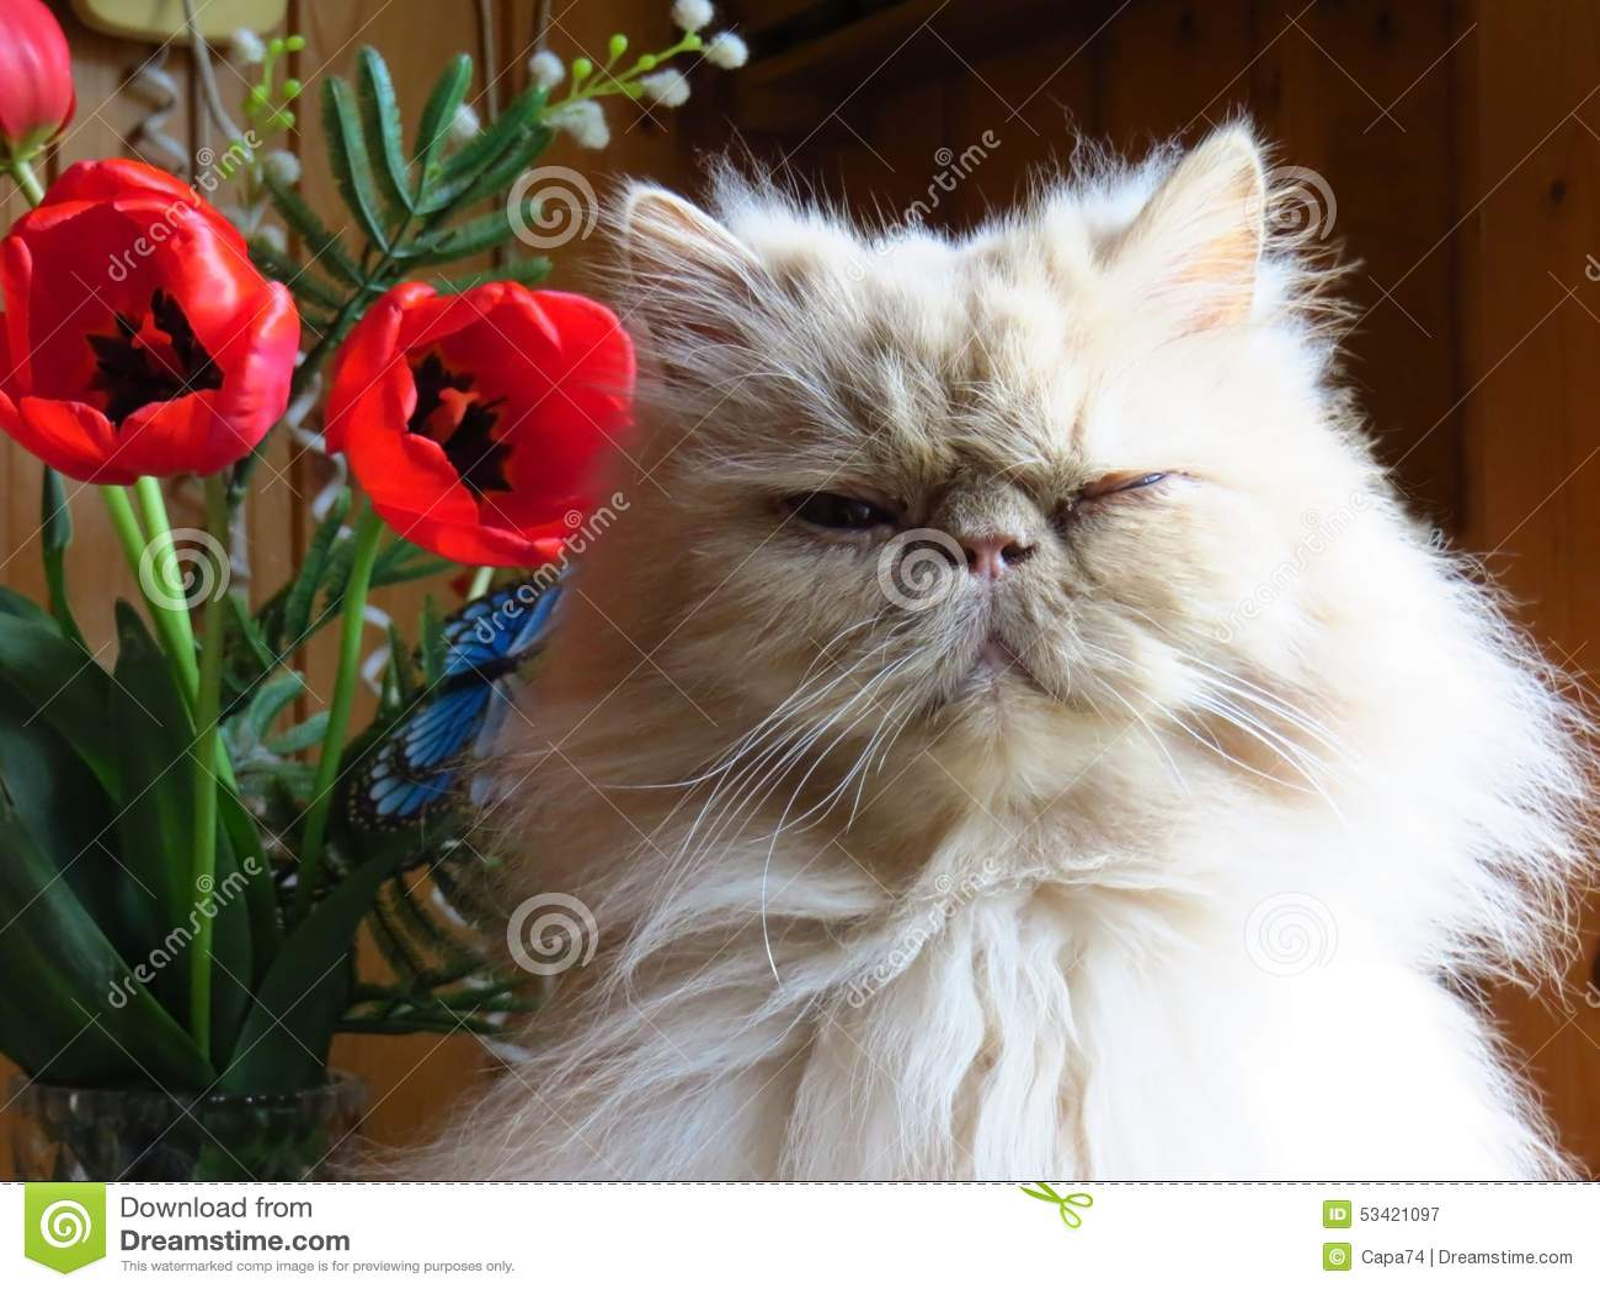 Retrato del cervatillo adulto del gato persa con las flores